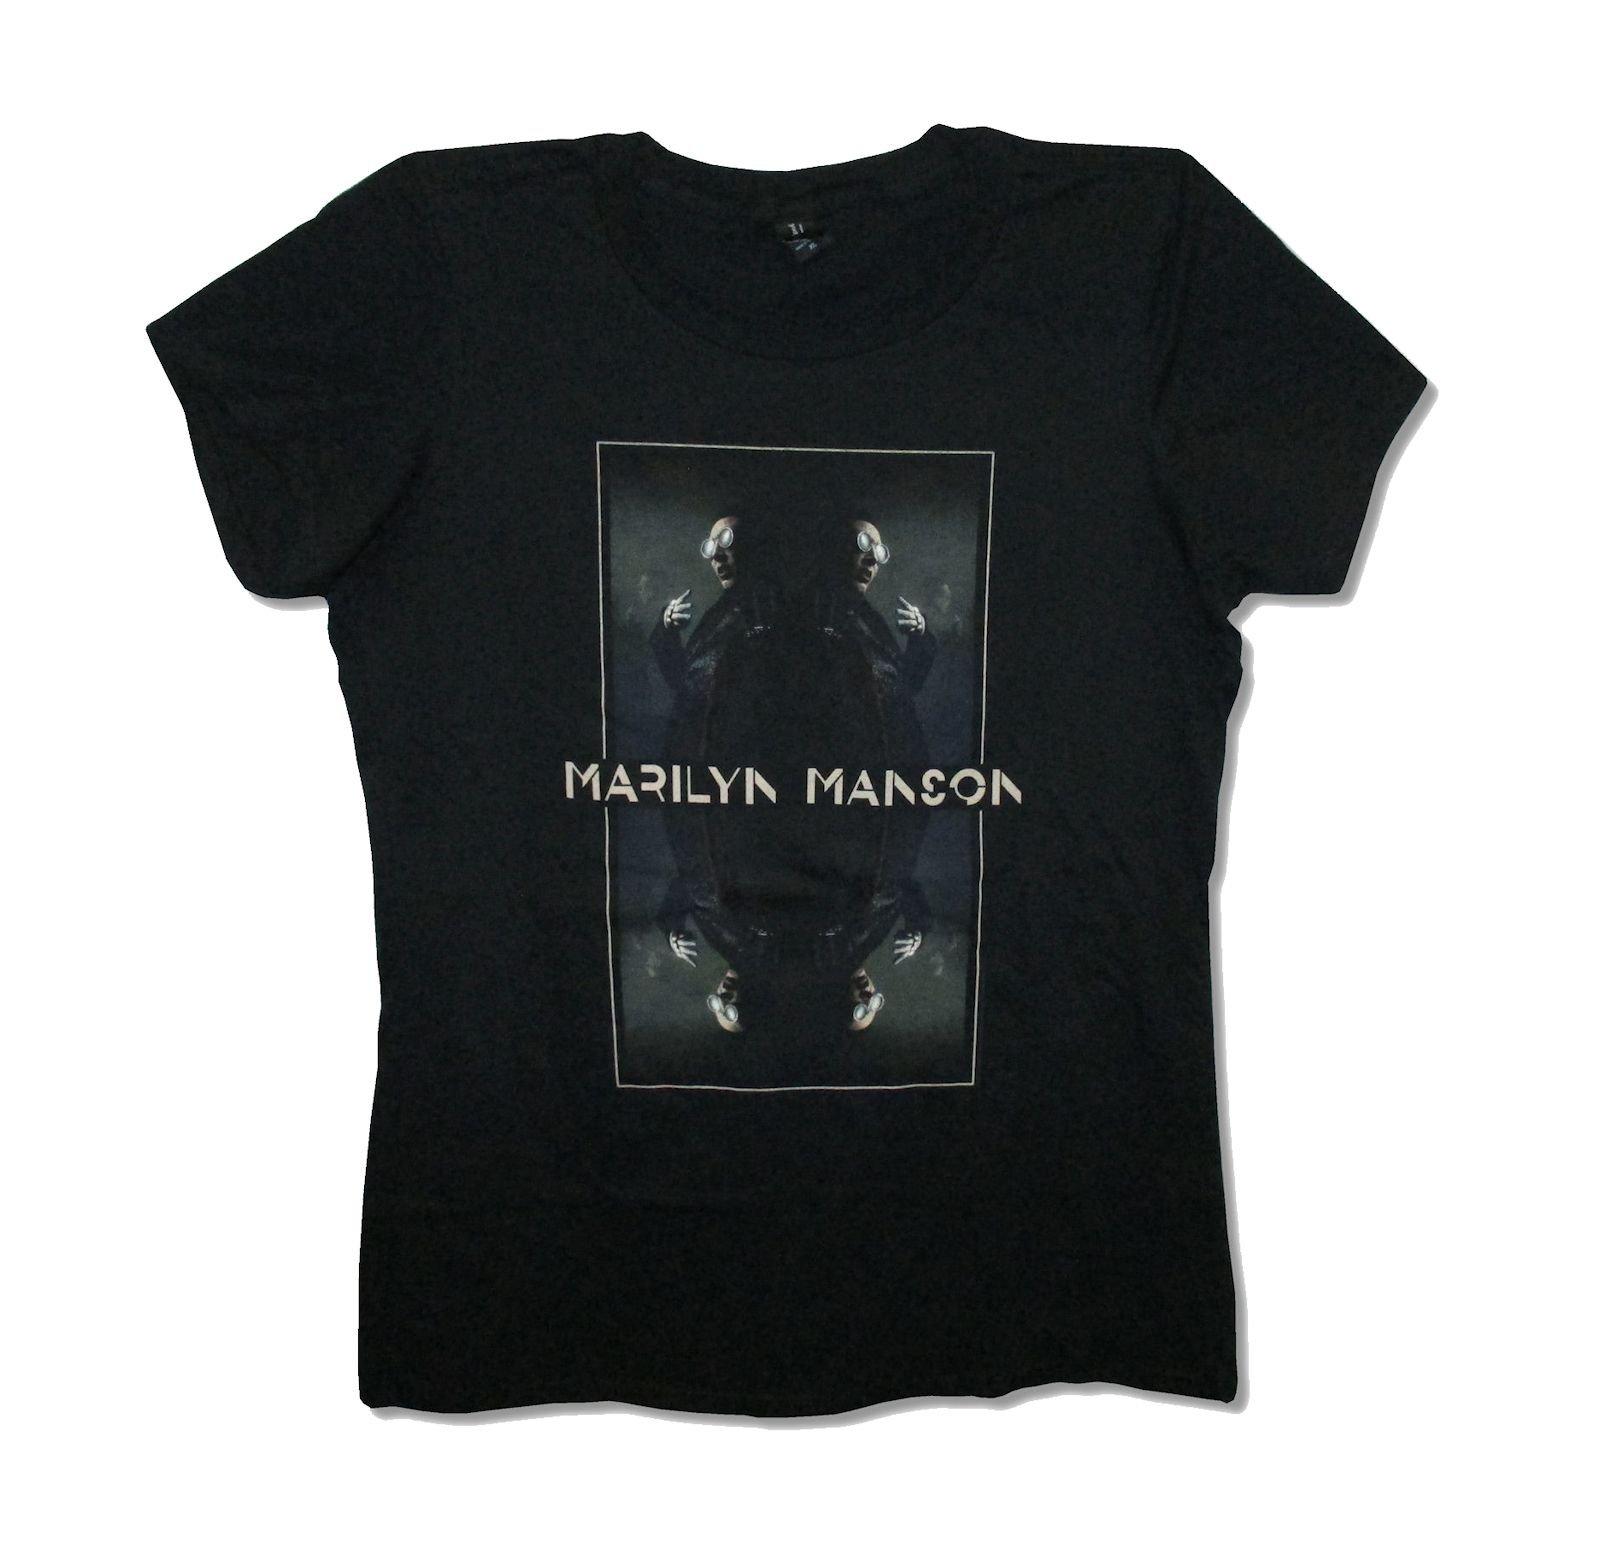 Marilyn Manson Mirro Image Babydoll T Shirt 4434